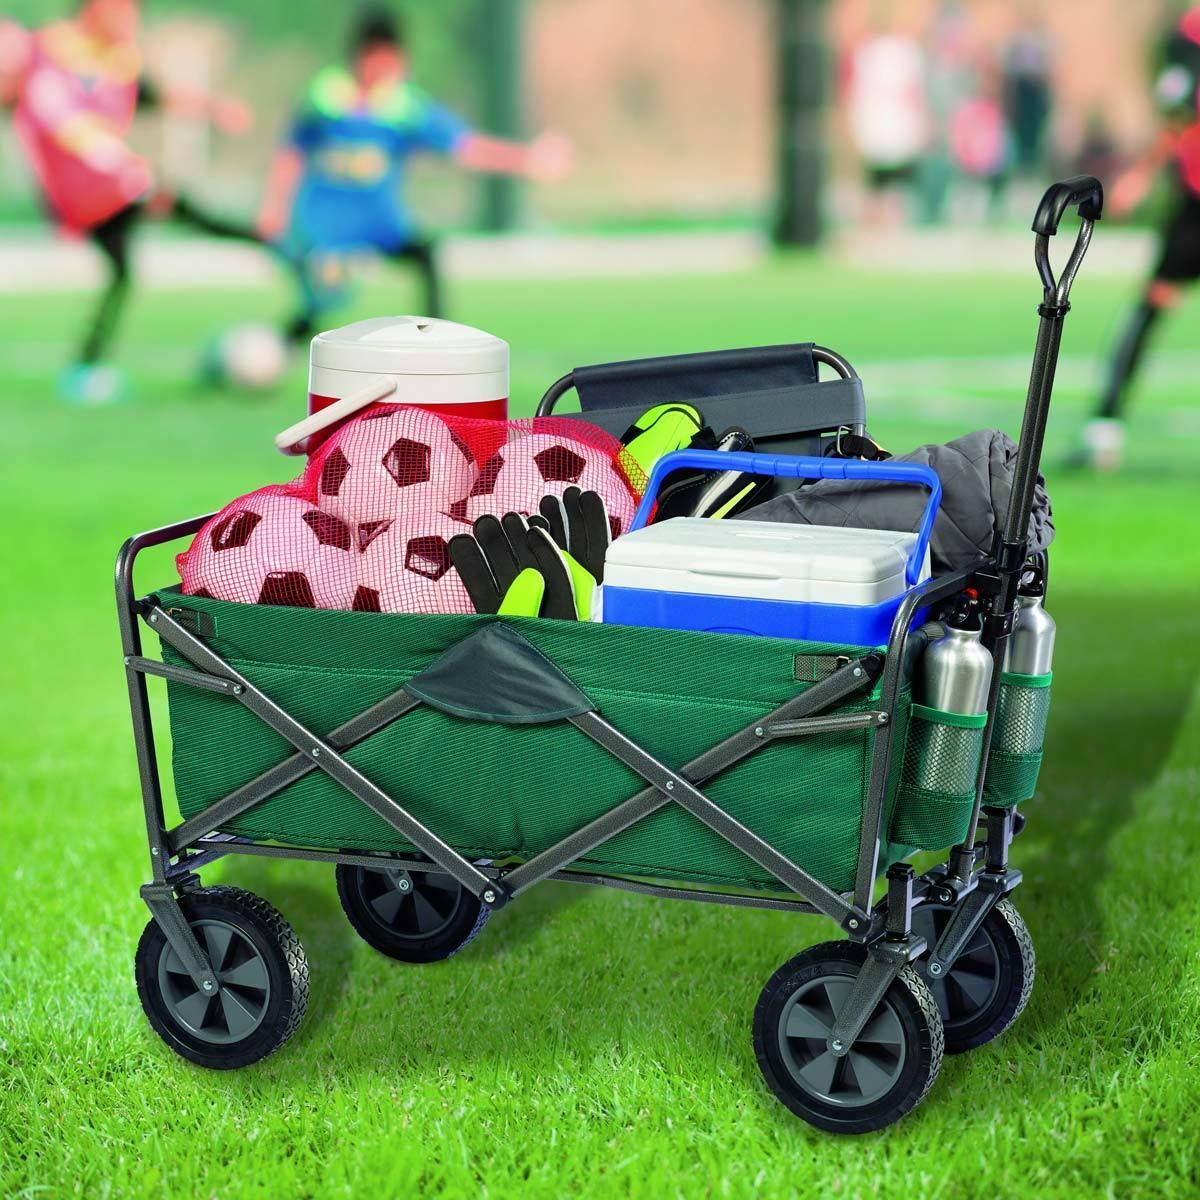 Tofasco Folding Wagon Folding wagon, Beach wagon